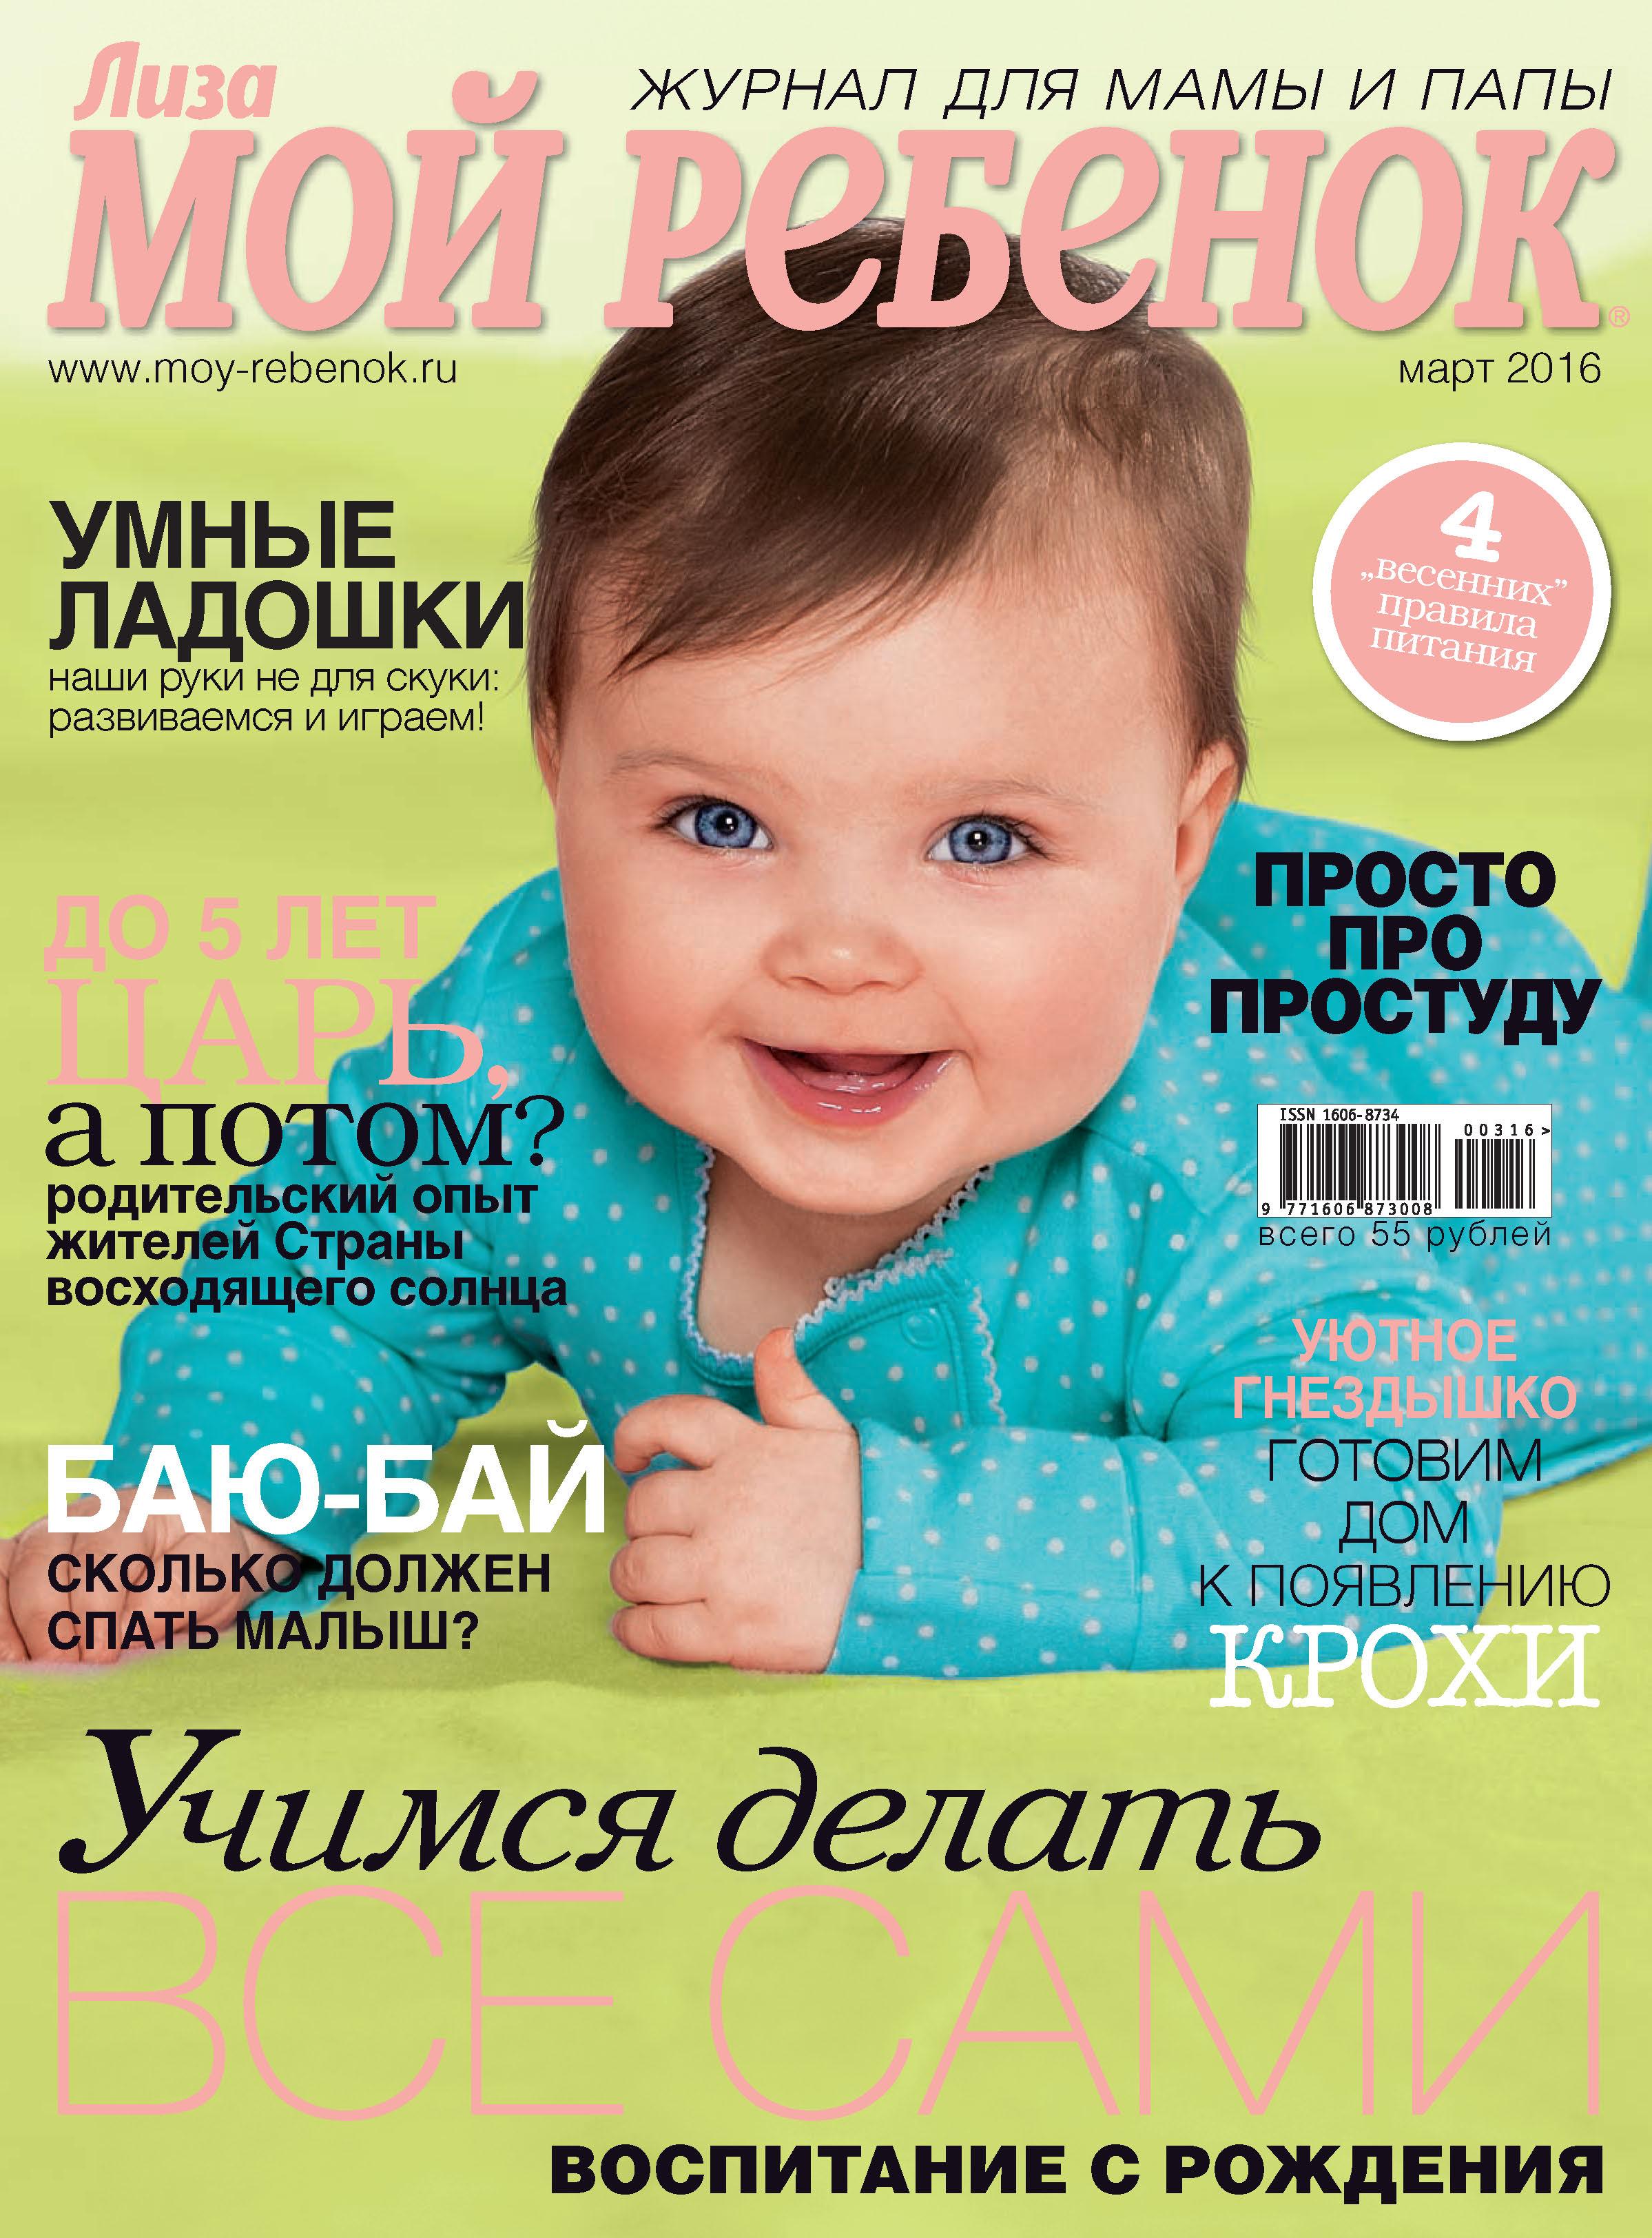 ИД «Бурда» Журнал «Лиза. Мой ребенок» №03/2016 ид бурда журнал лиза мой ребенок 03 2014